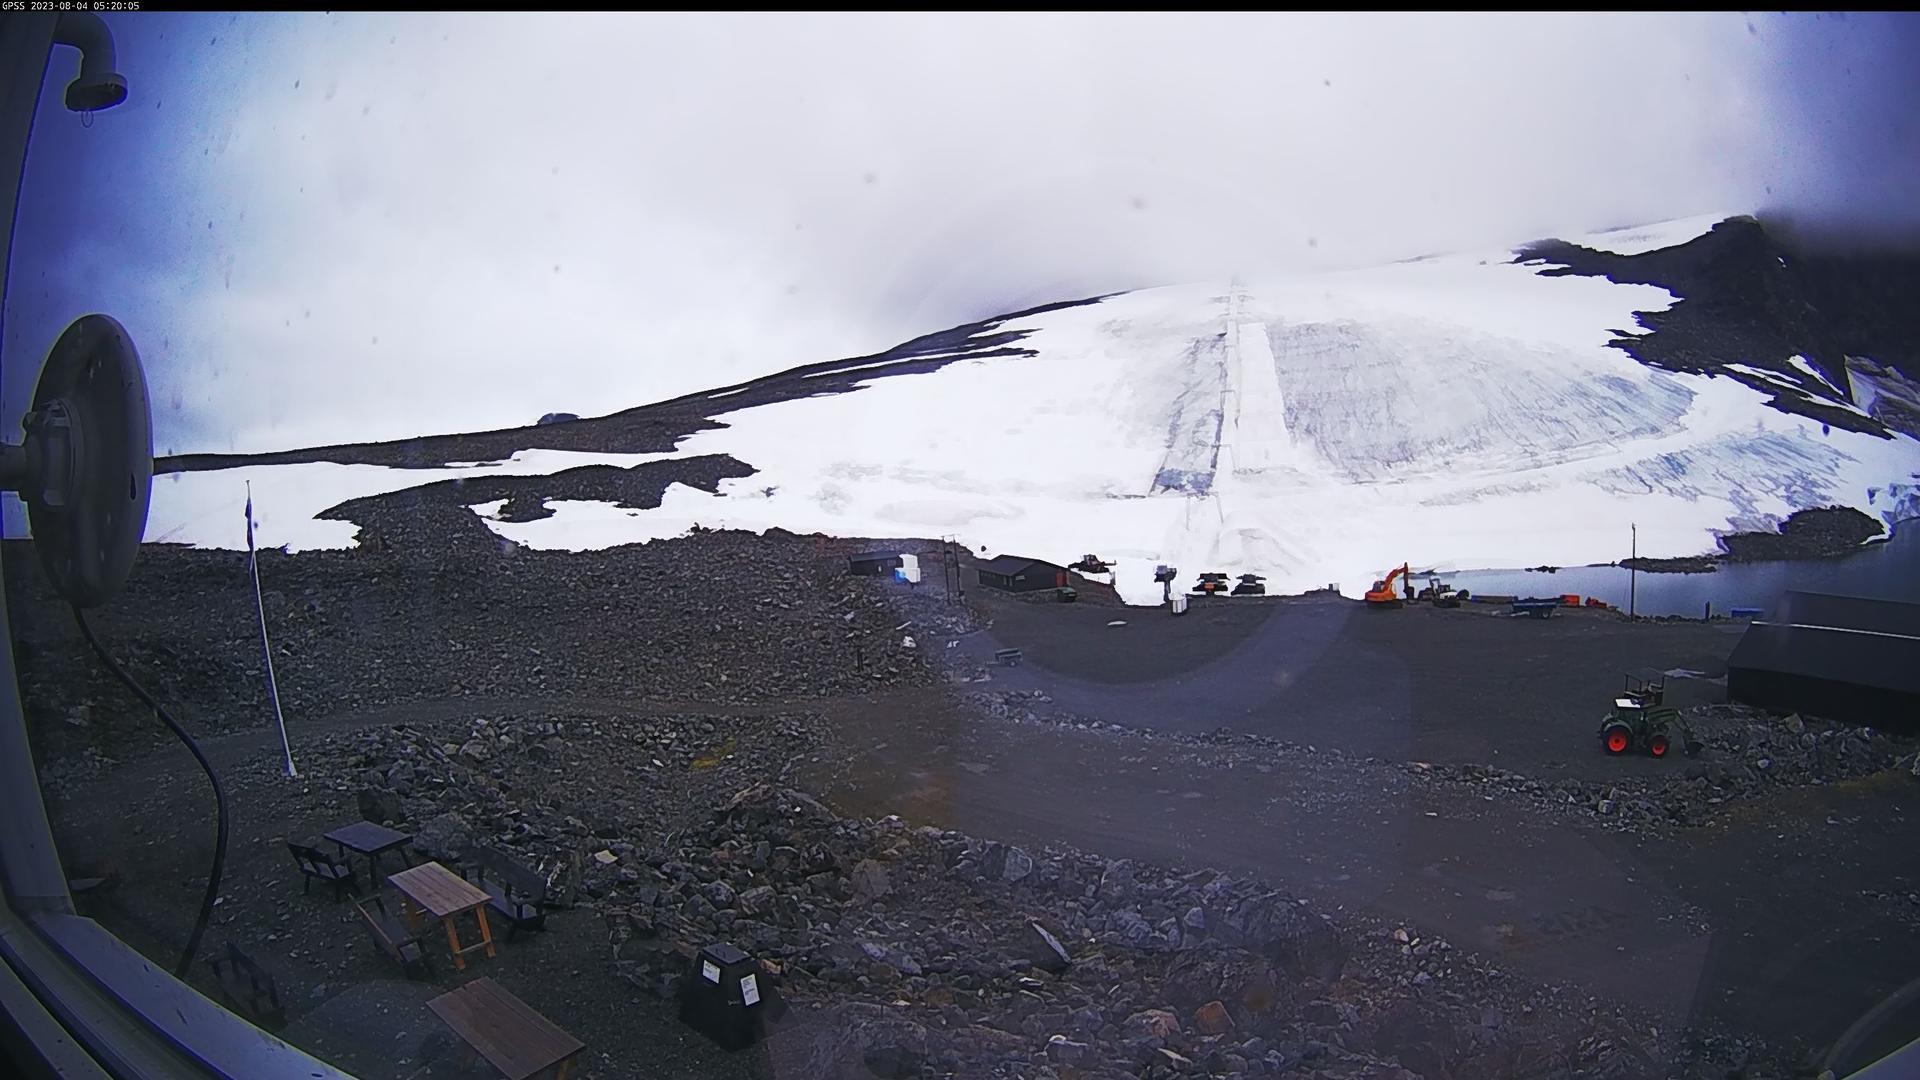 Webcam Visdalen: Galdhøpiggen skisenter − Sommerskisenter